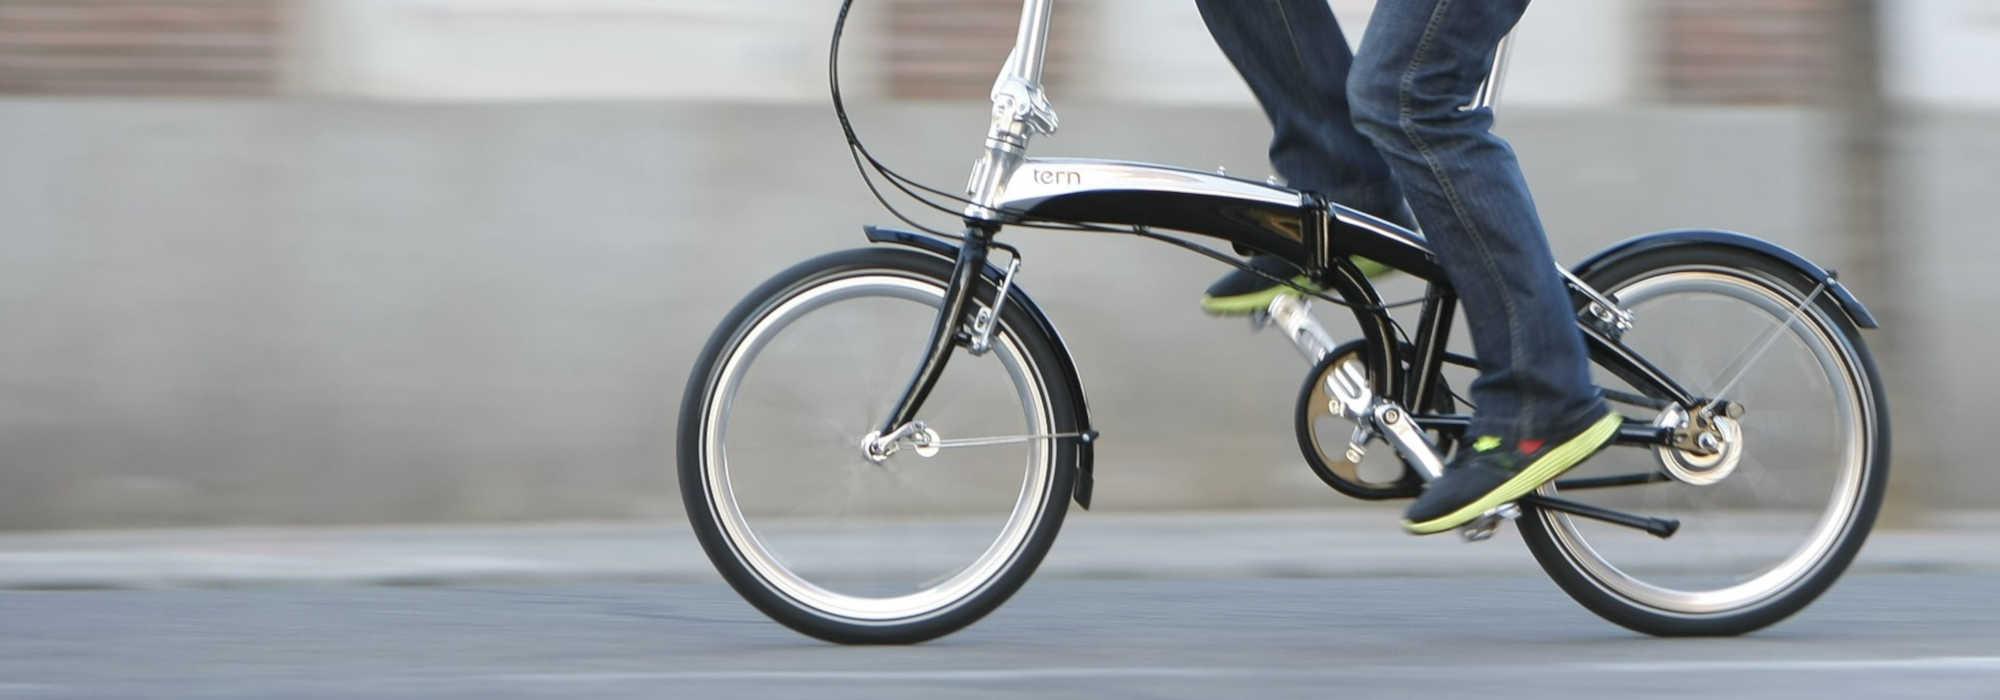 E-Bike Falträder Leonberg